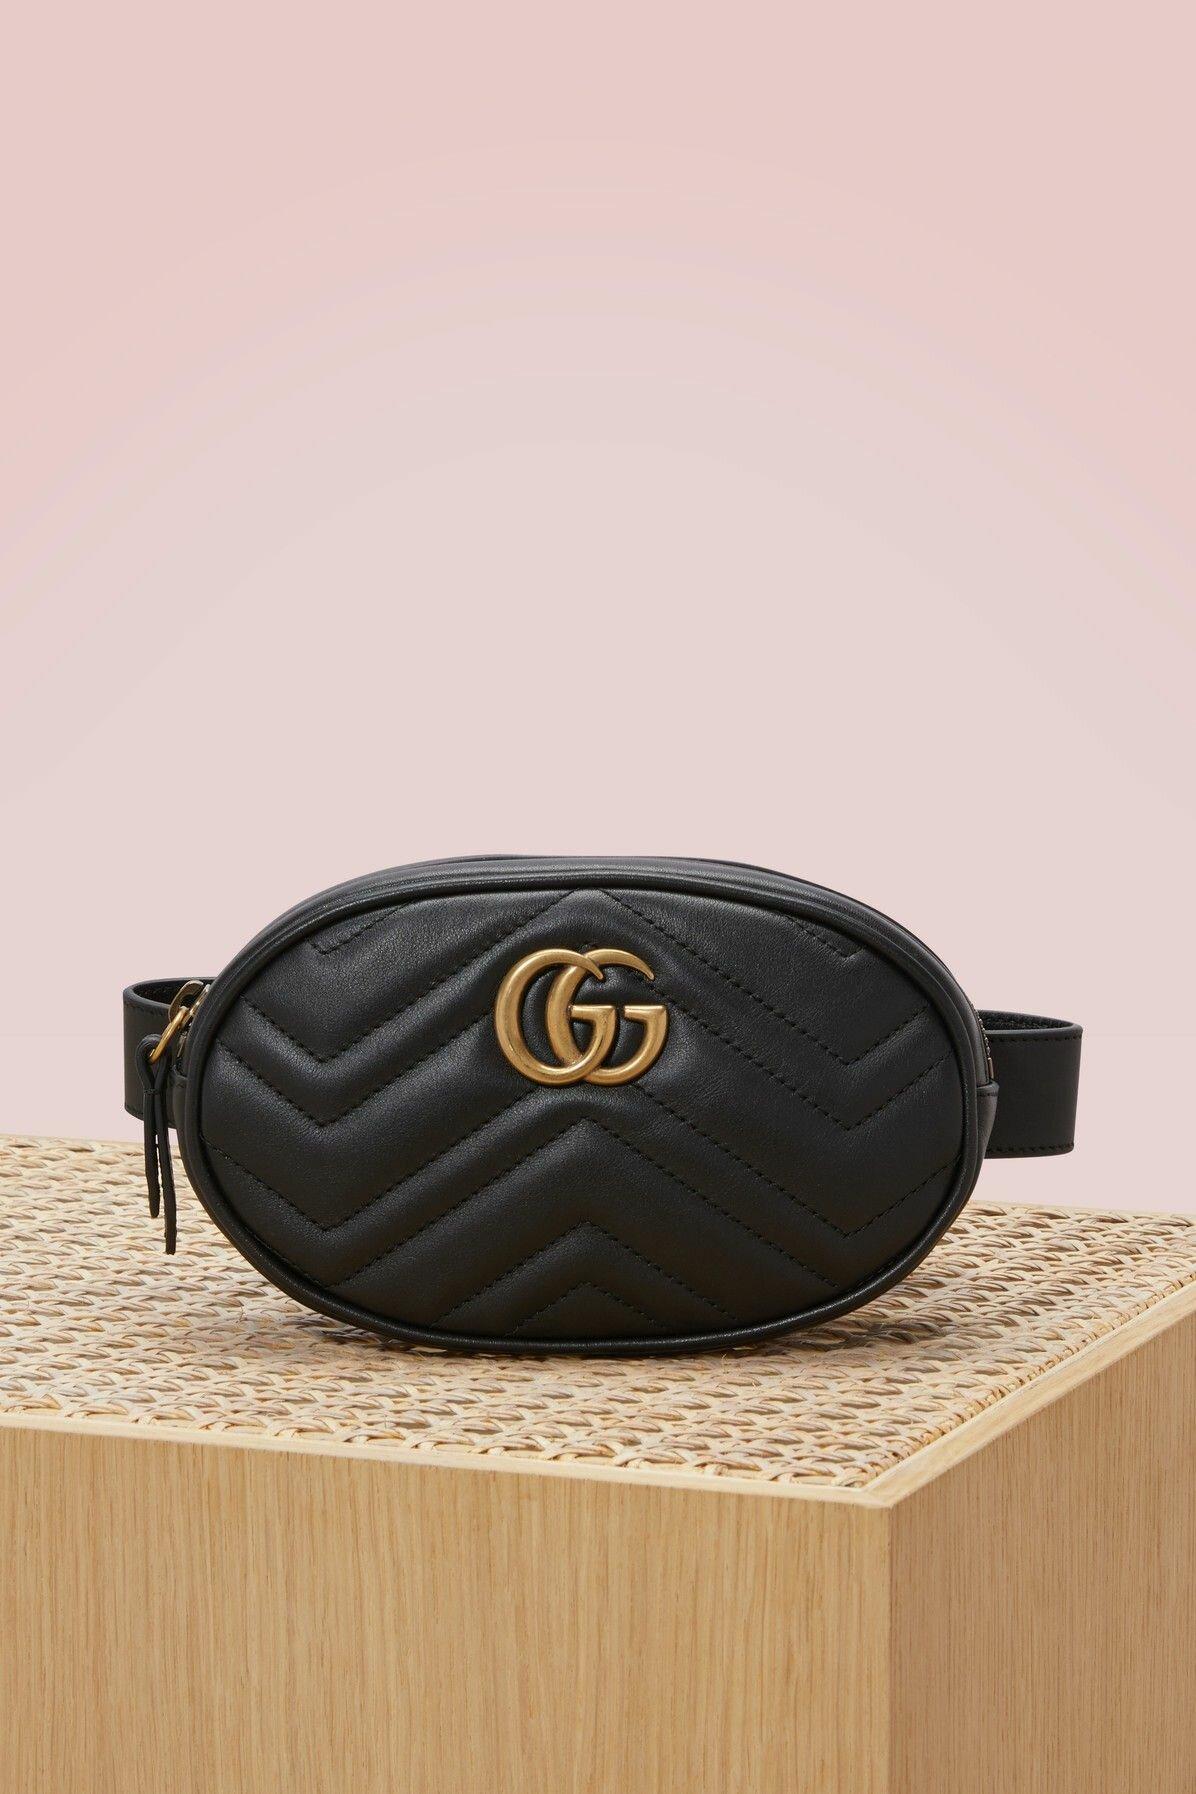 Поясная сумочка GG Marmont в Сумах